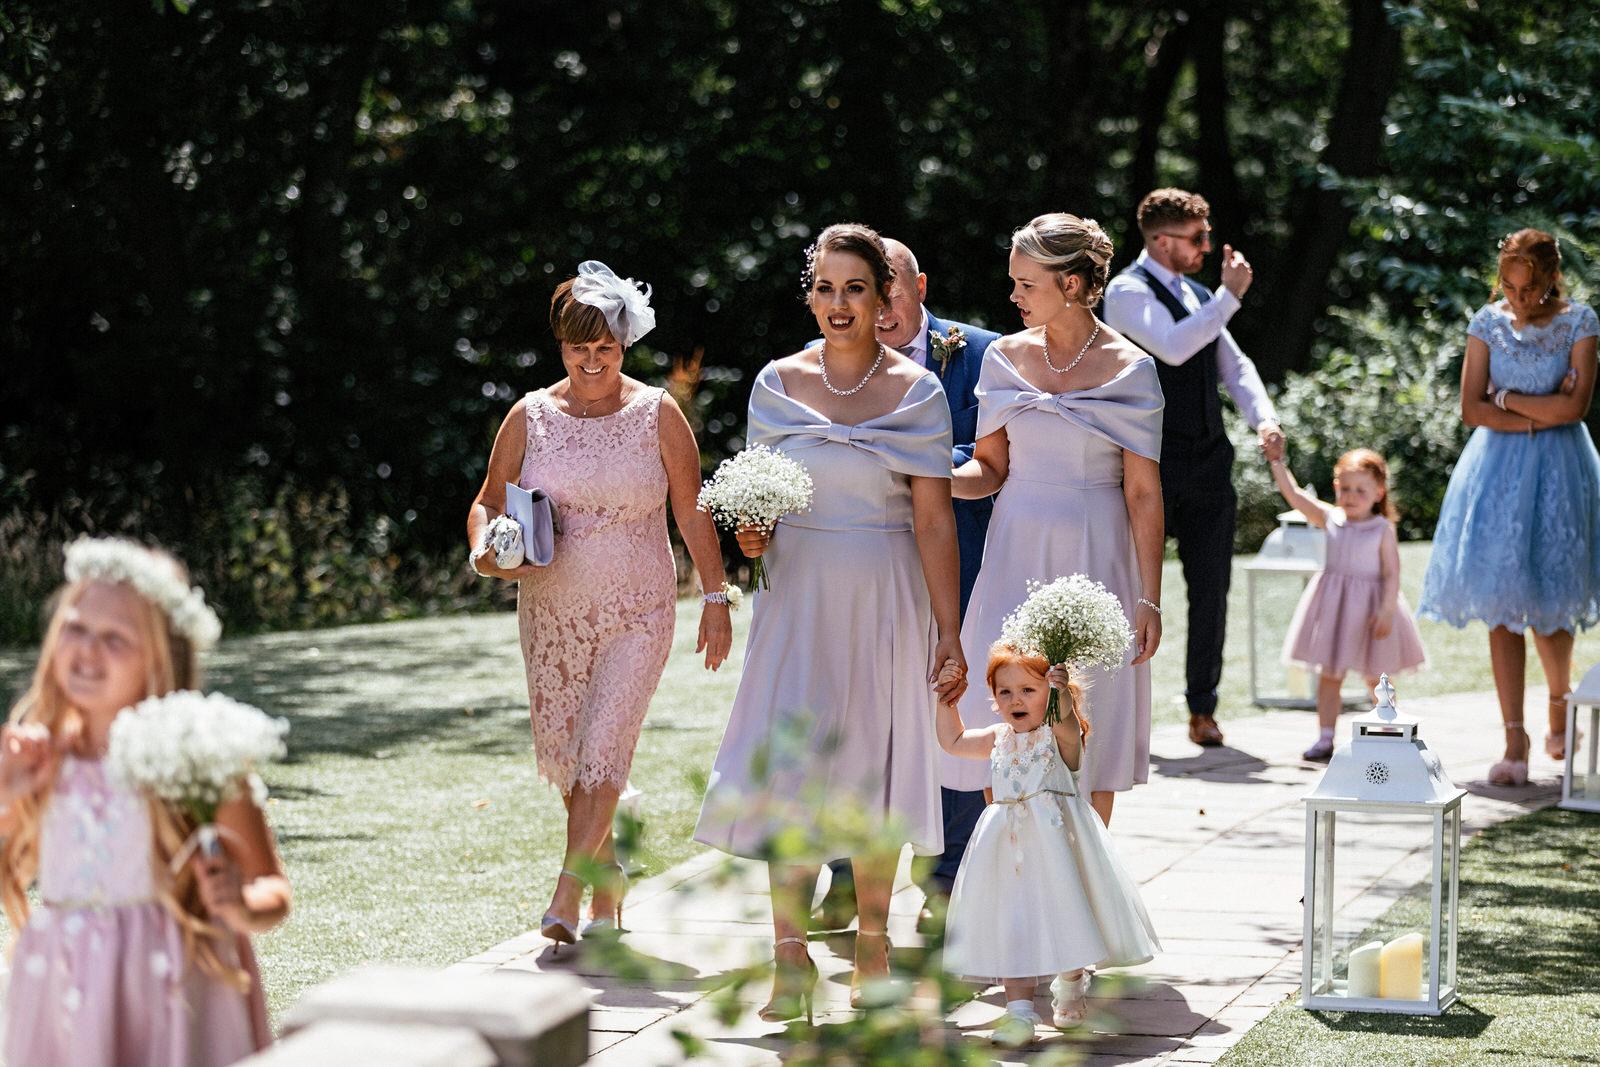 Moddershall-Oaks-Spa-Wedding-Photographer-028.jpg